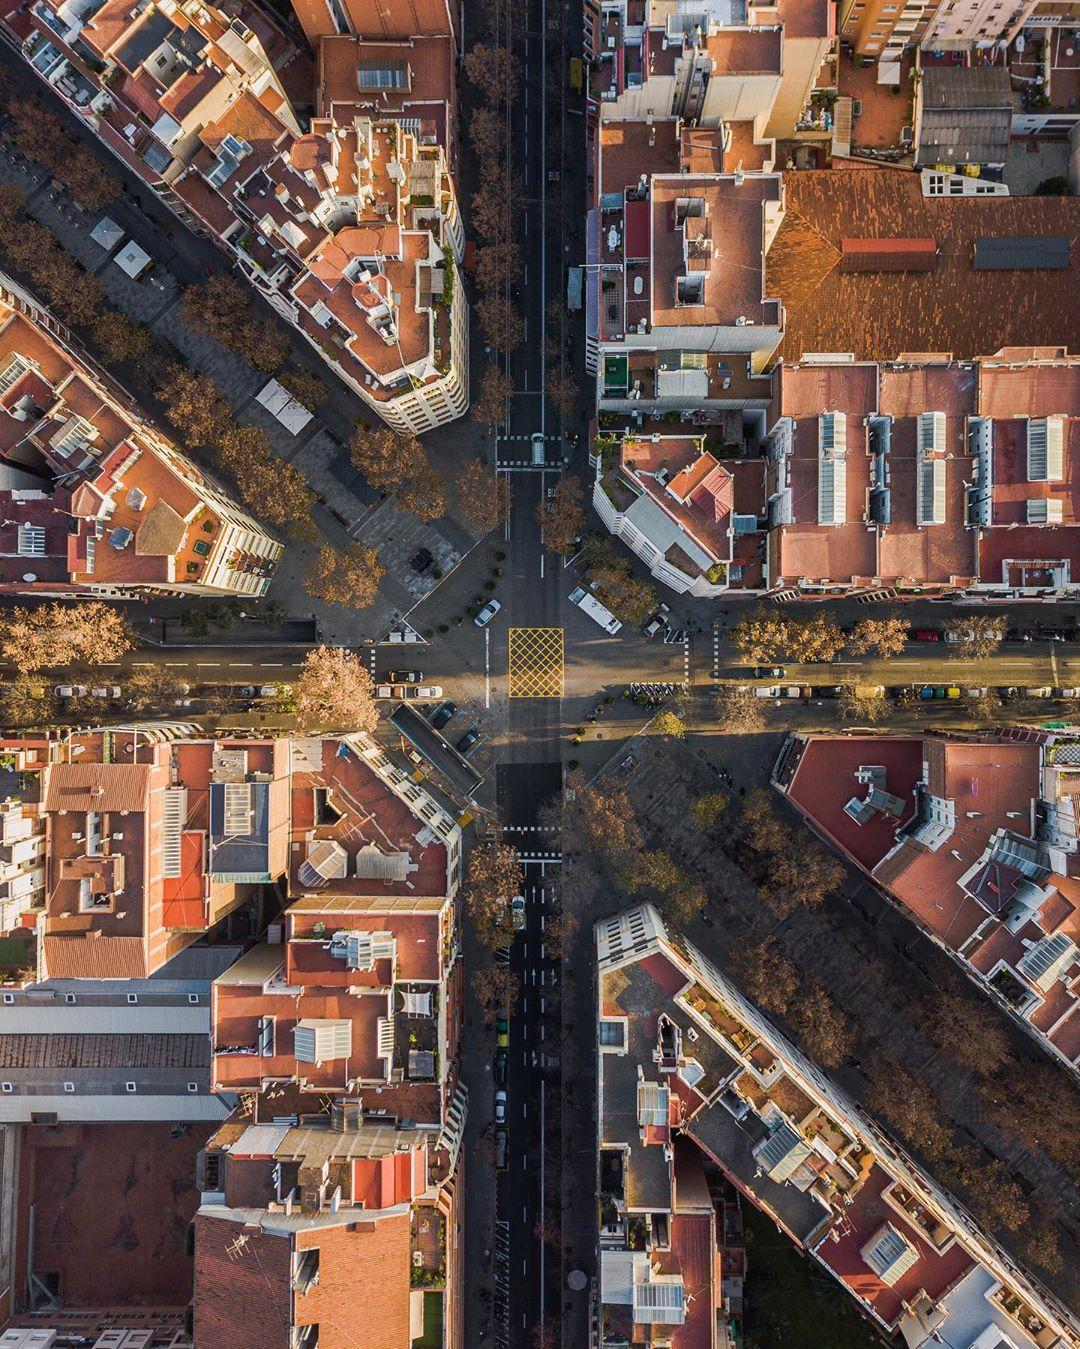 Barcelona aérea drone Marton Mogyorosy loqueva (10)